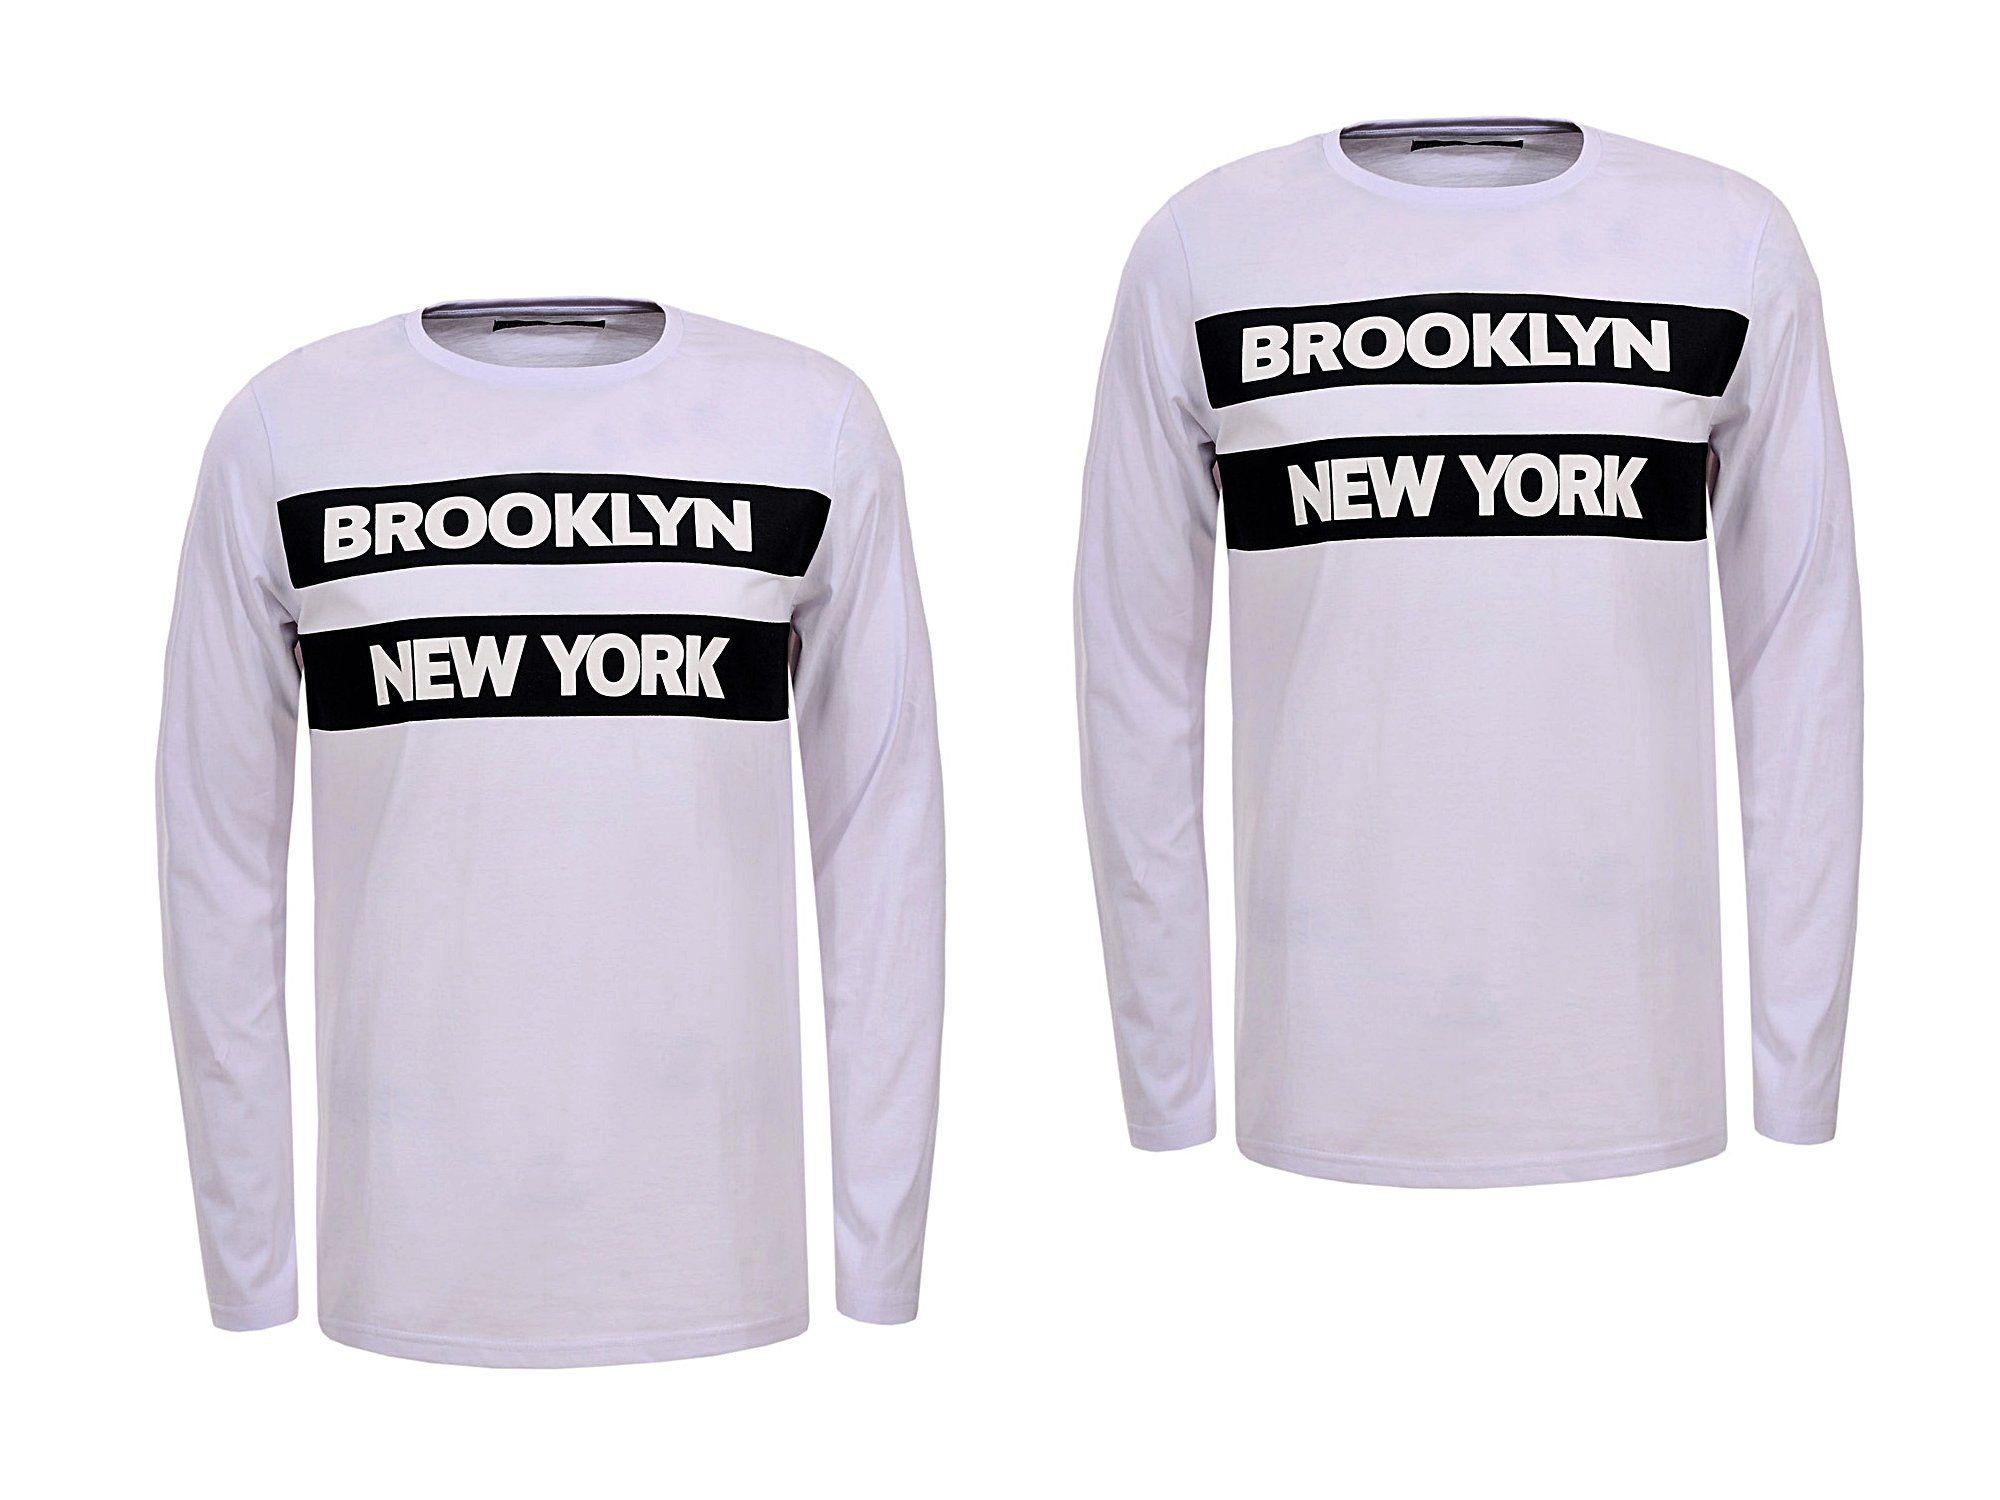 Longsleeve Bluzka Meska Z Dlugim Rekawem Bluza Xl 6936881063 Oficjalne Archiwum Allegro Brooklyn New York Sweatshirts Fashion